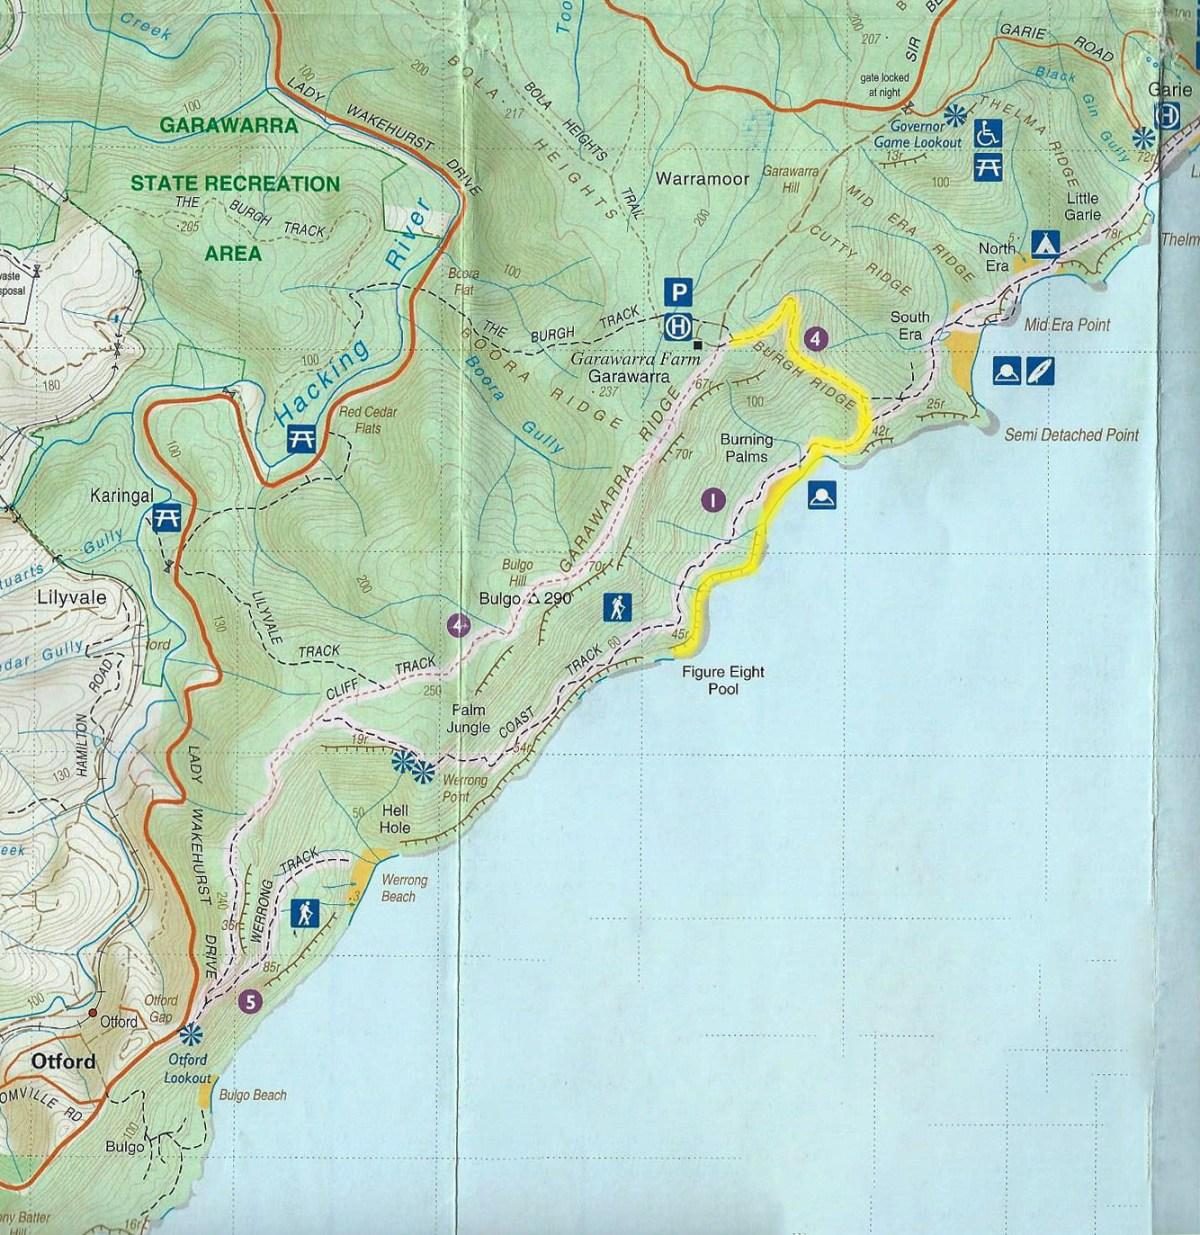 Map-RoyalNP-Figure8Pool